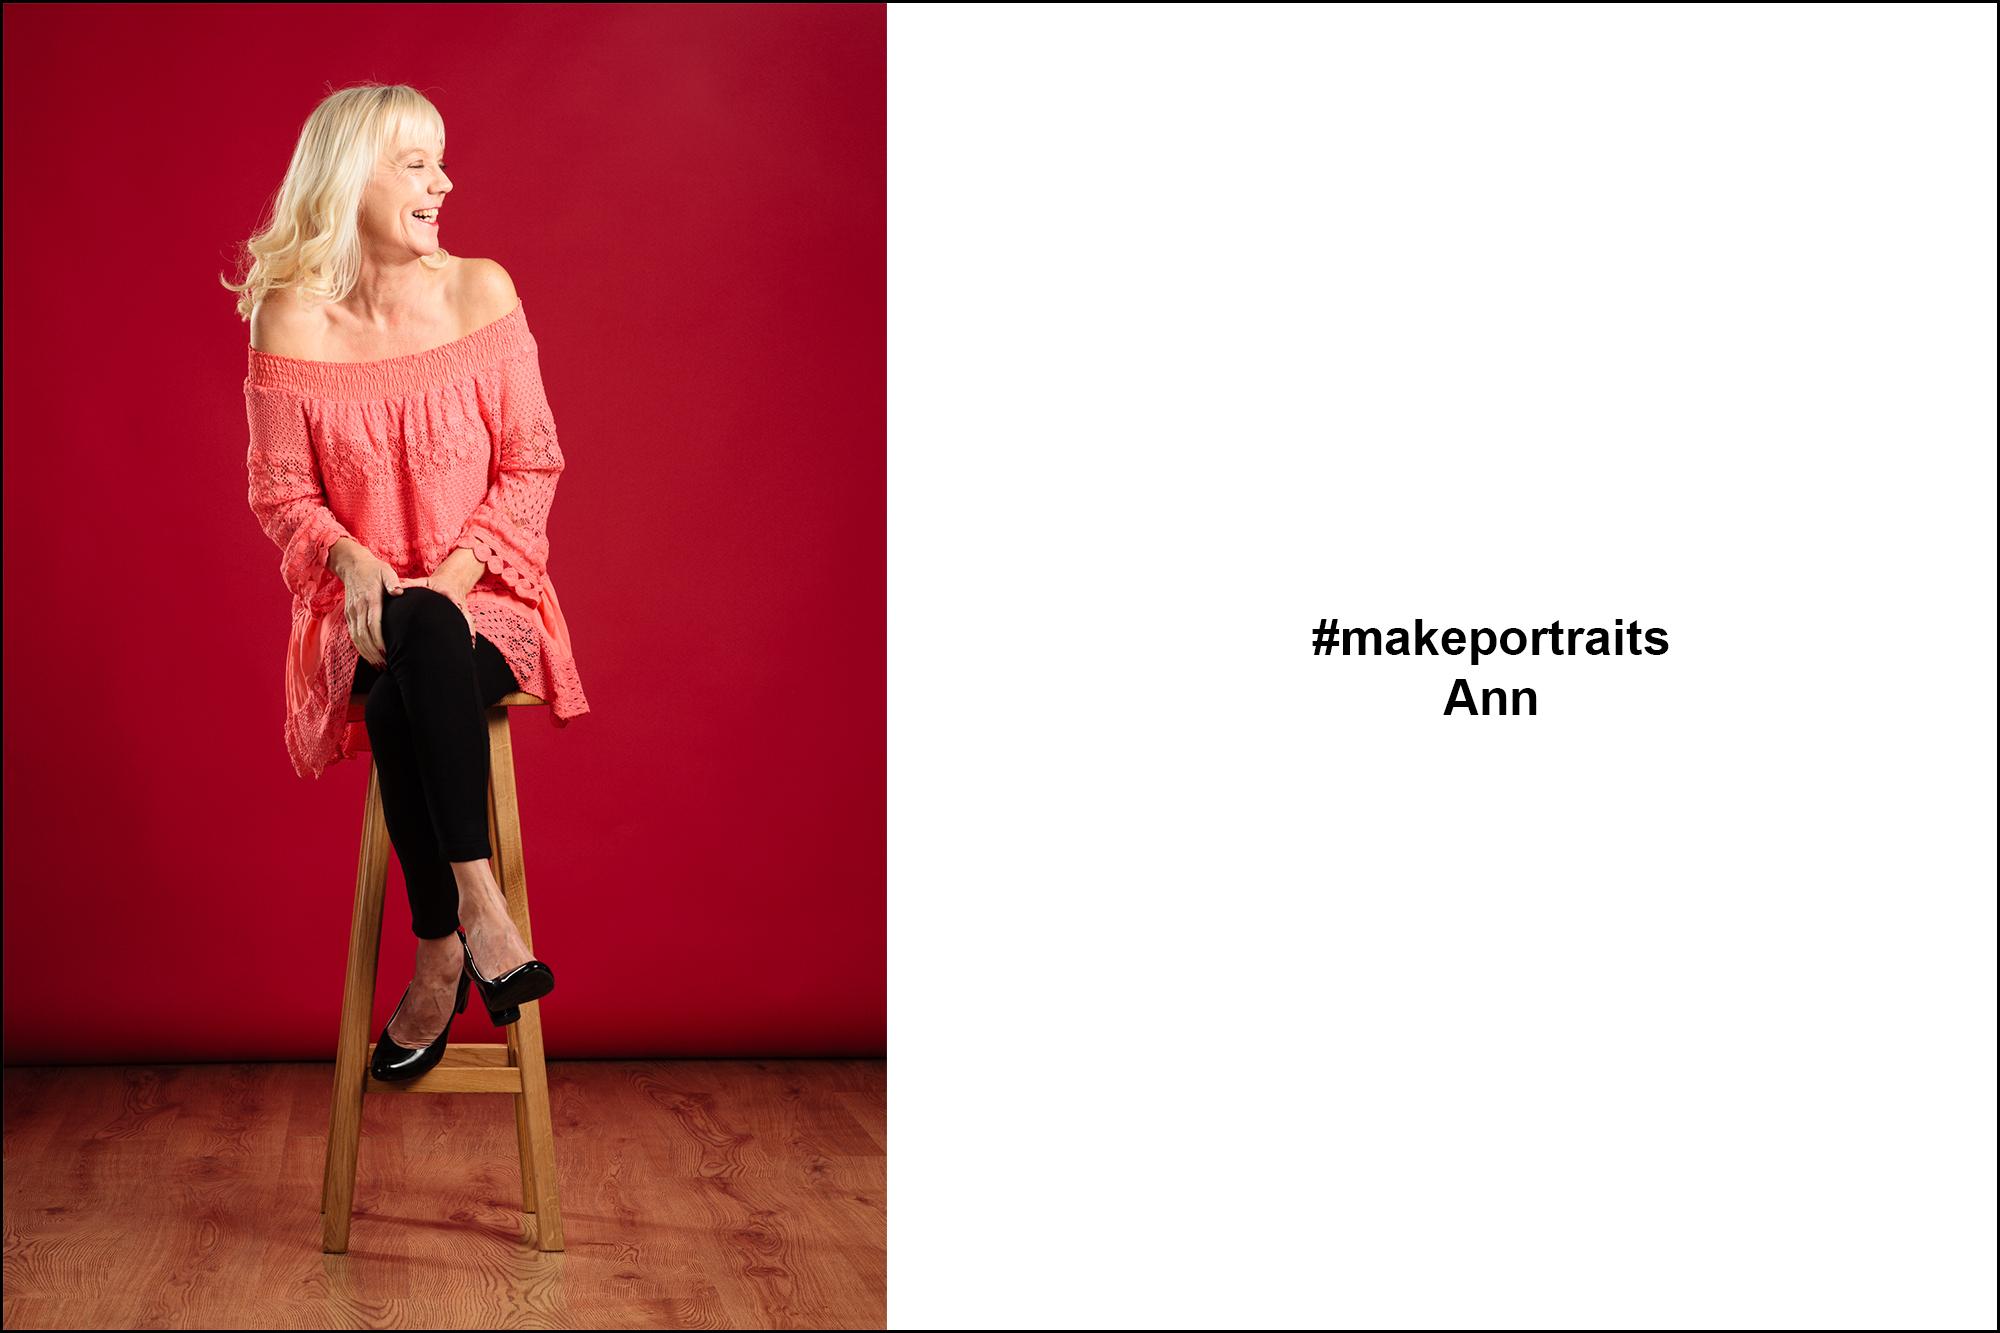 #makeportraits - Ann Riley